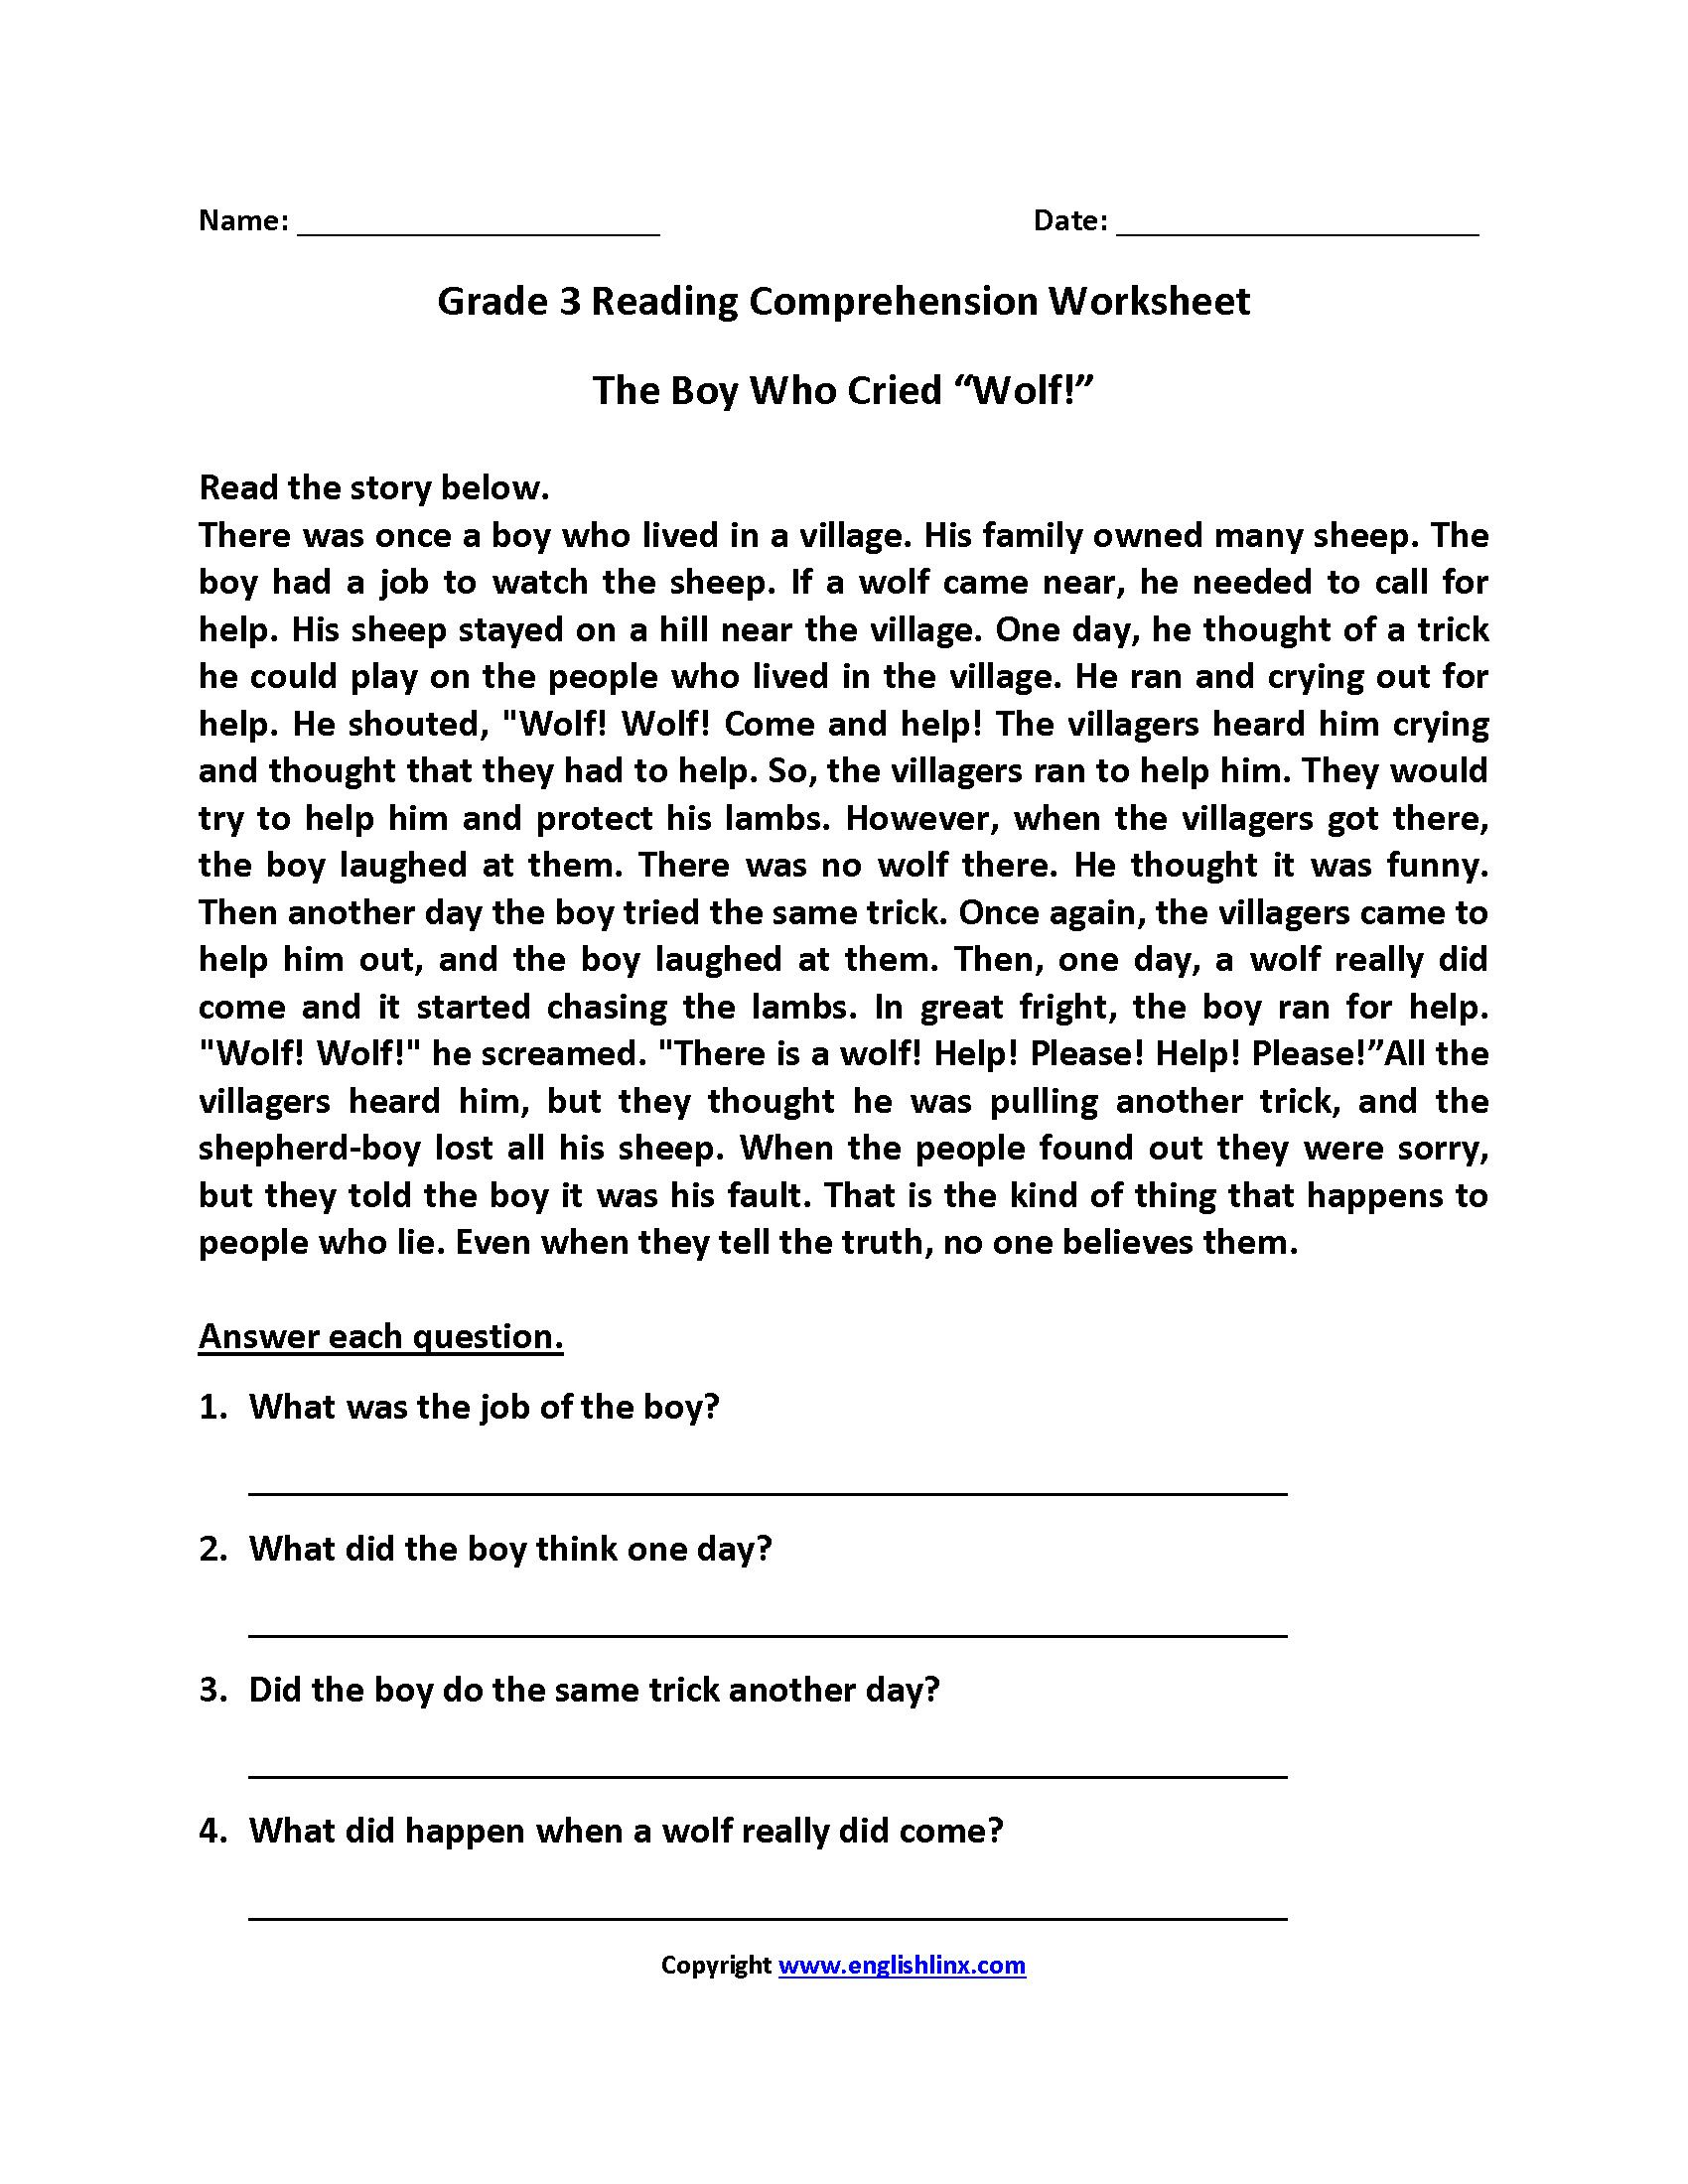 3 Reading Comprehension Worksheets Third Grade 3 Ba C8f